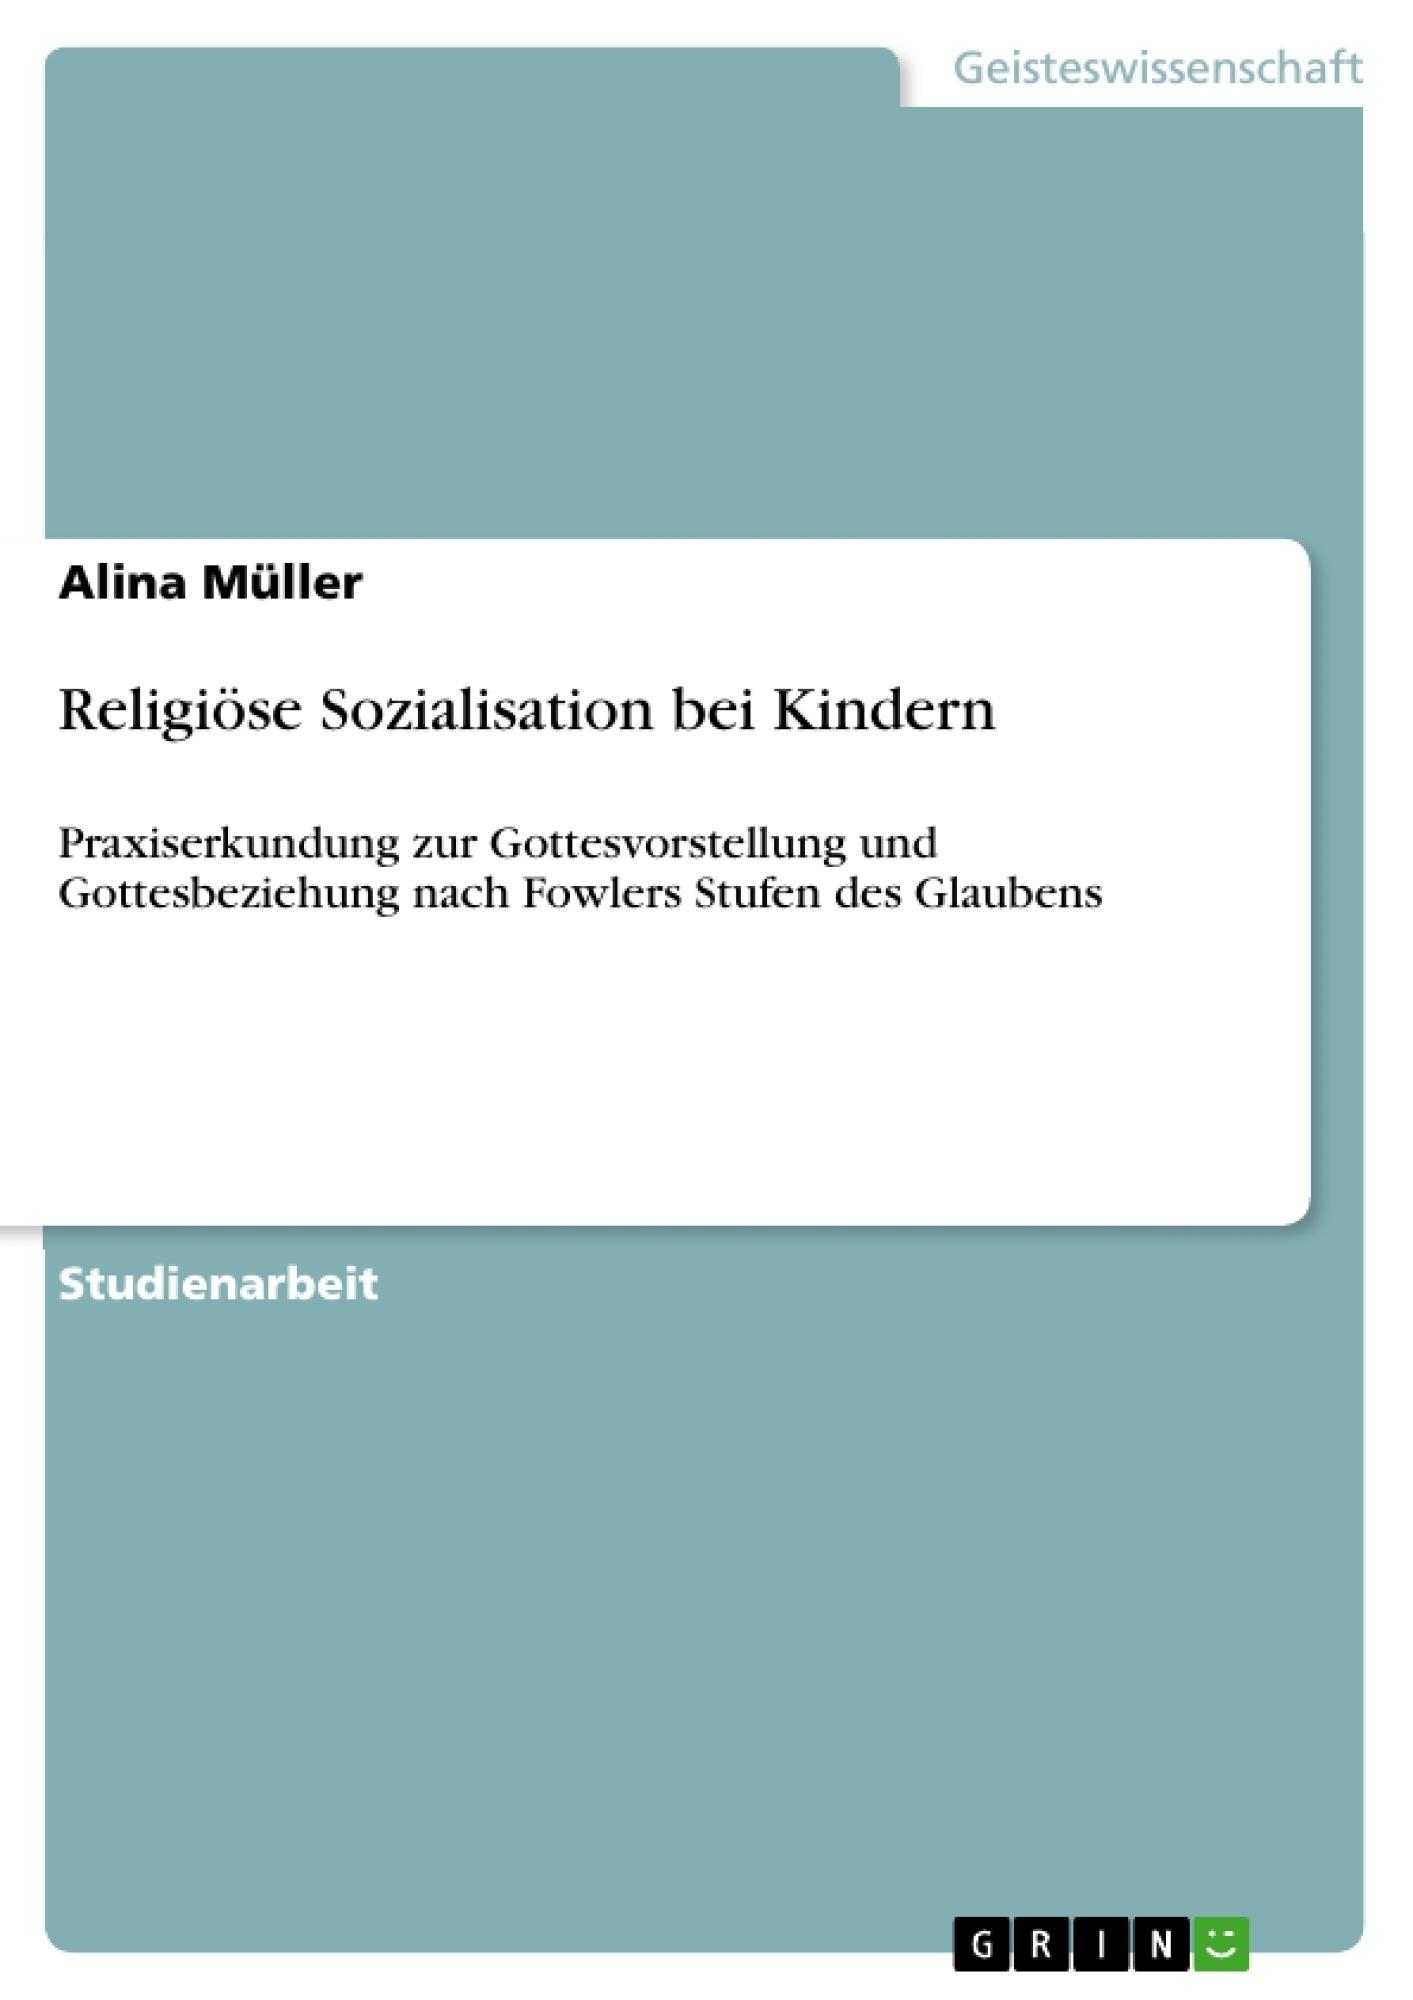 Titel: Religiöse Sozialisation bei Kindern